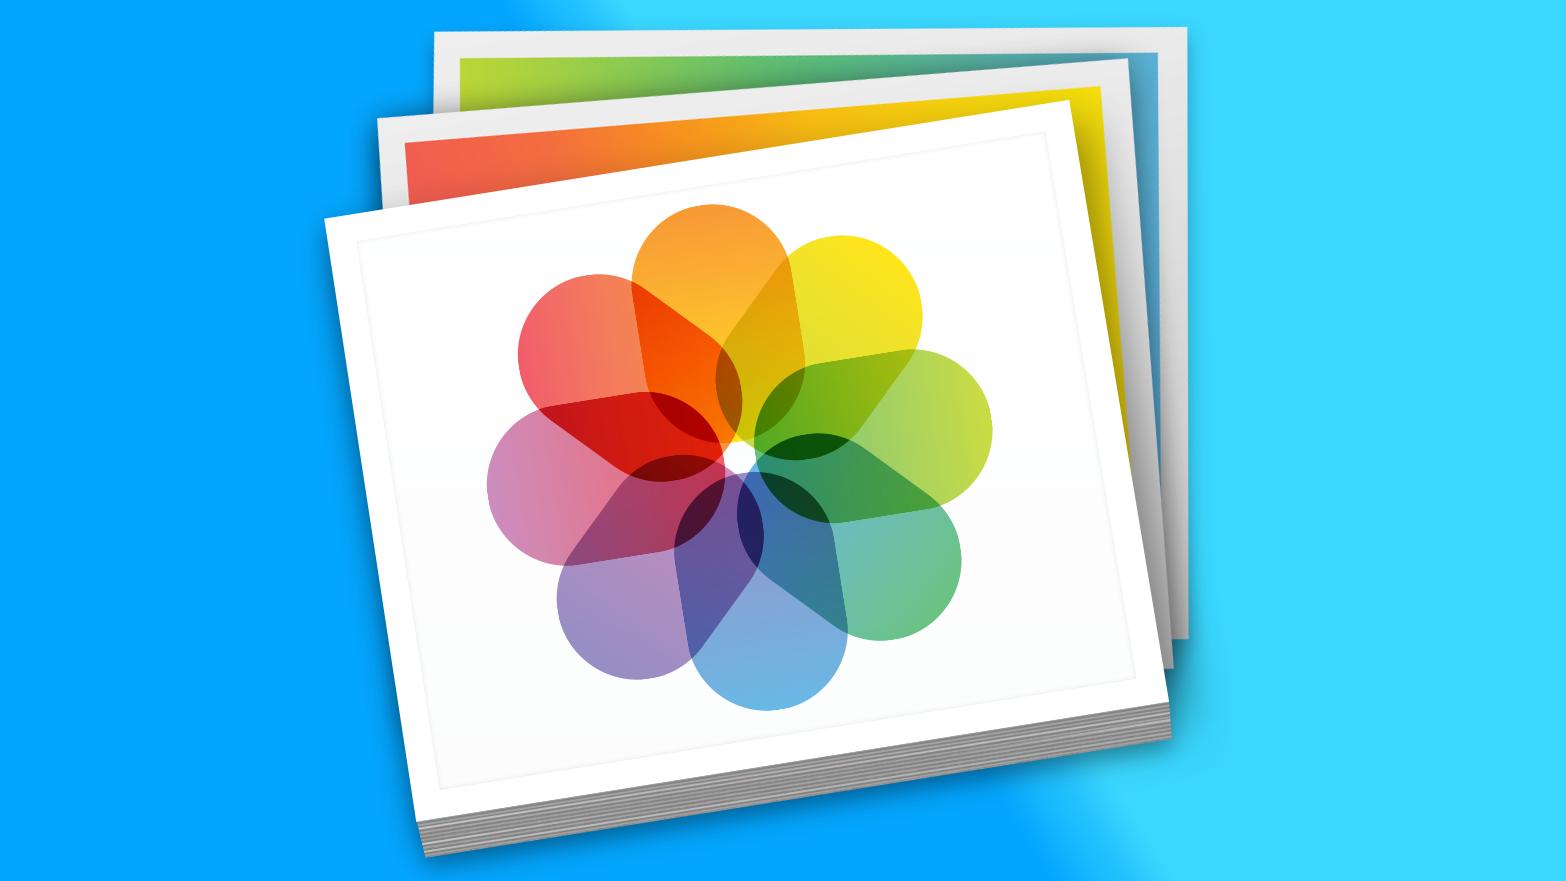 fotos-app-16x9